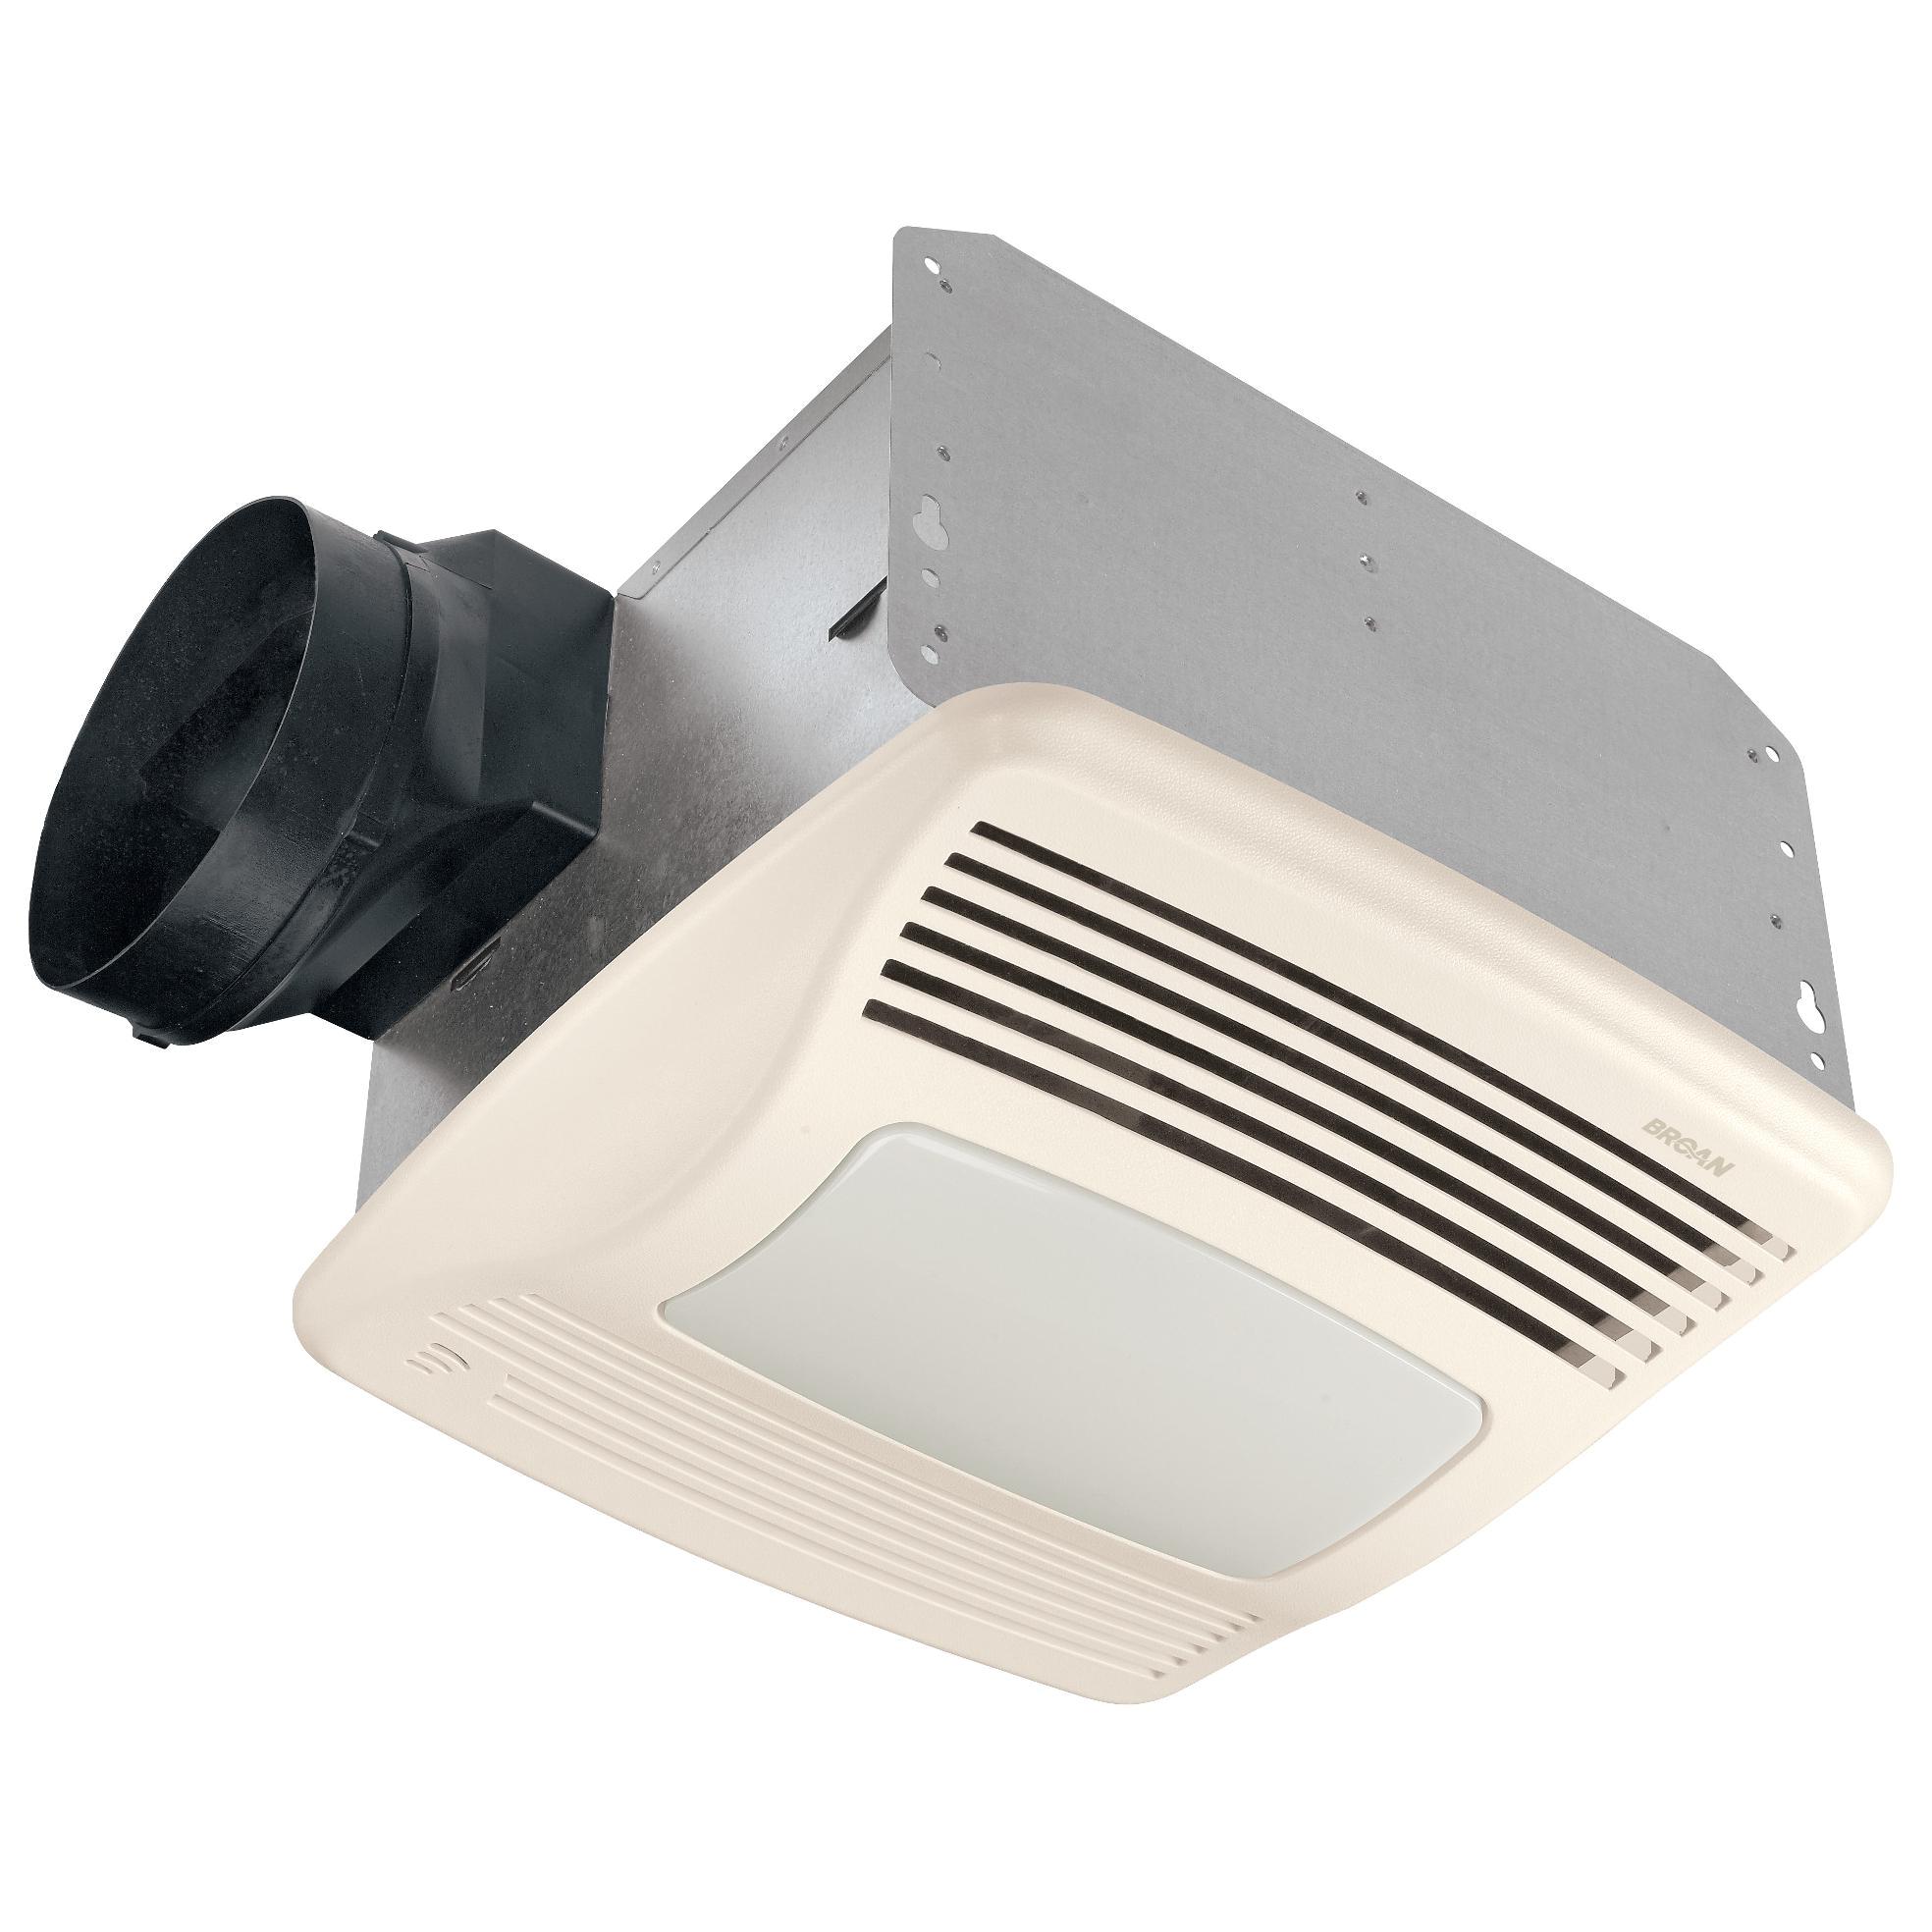 amazing bathroom exhaust fan with heat lamp in broan qtxe110s ultra silent humidity sensing auto f bath fan